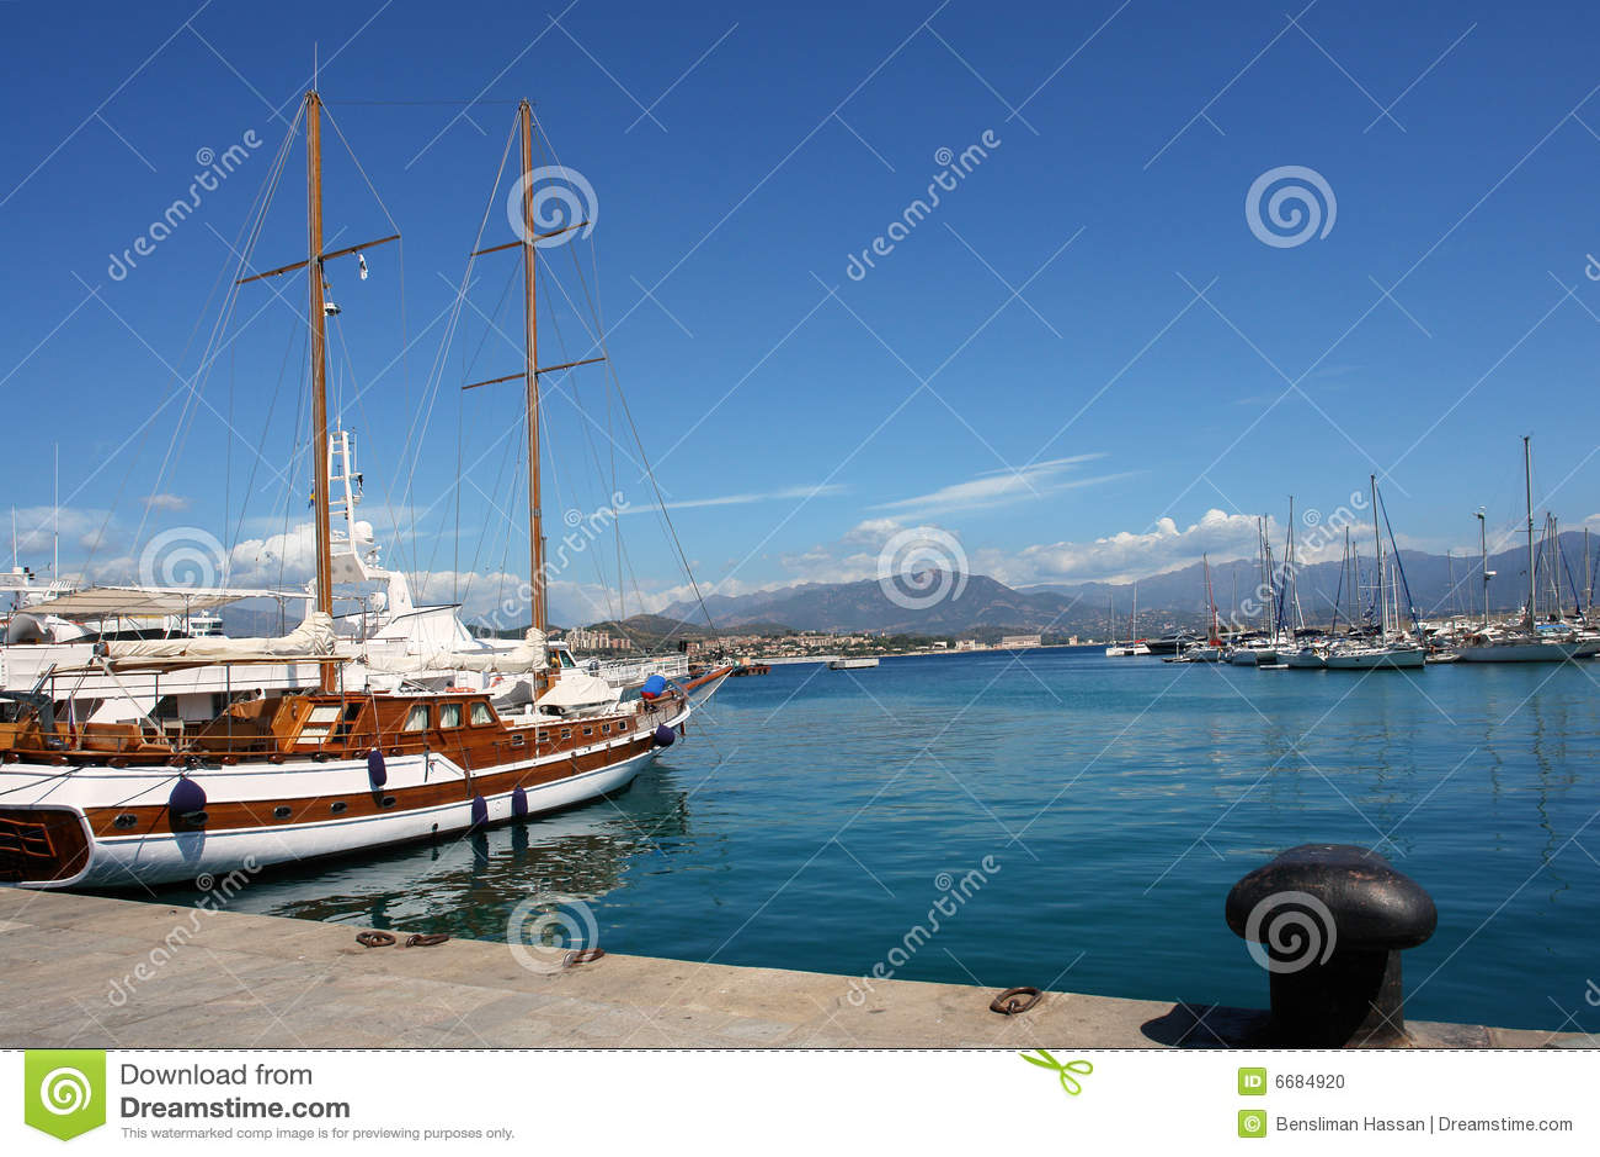 Segelnboot im Ajaccio habor